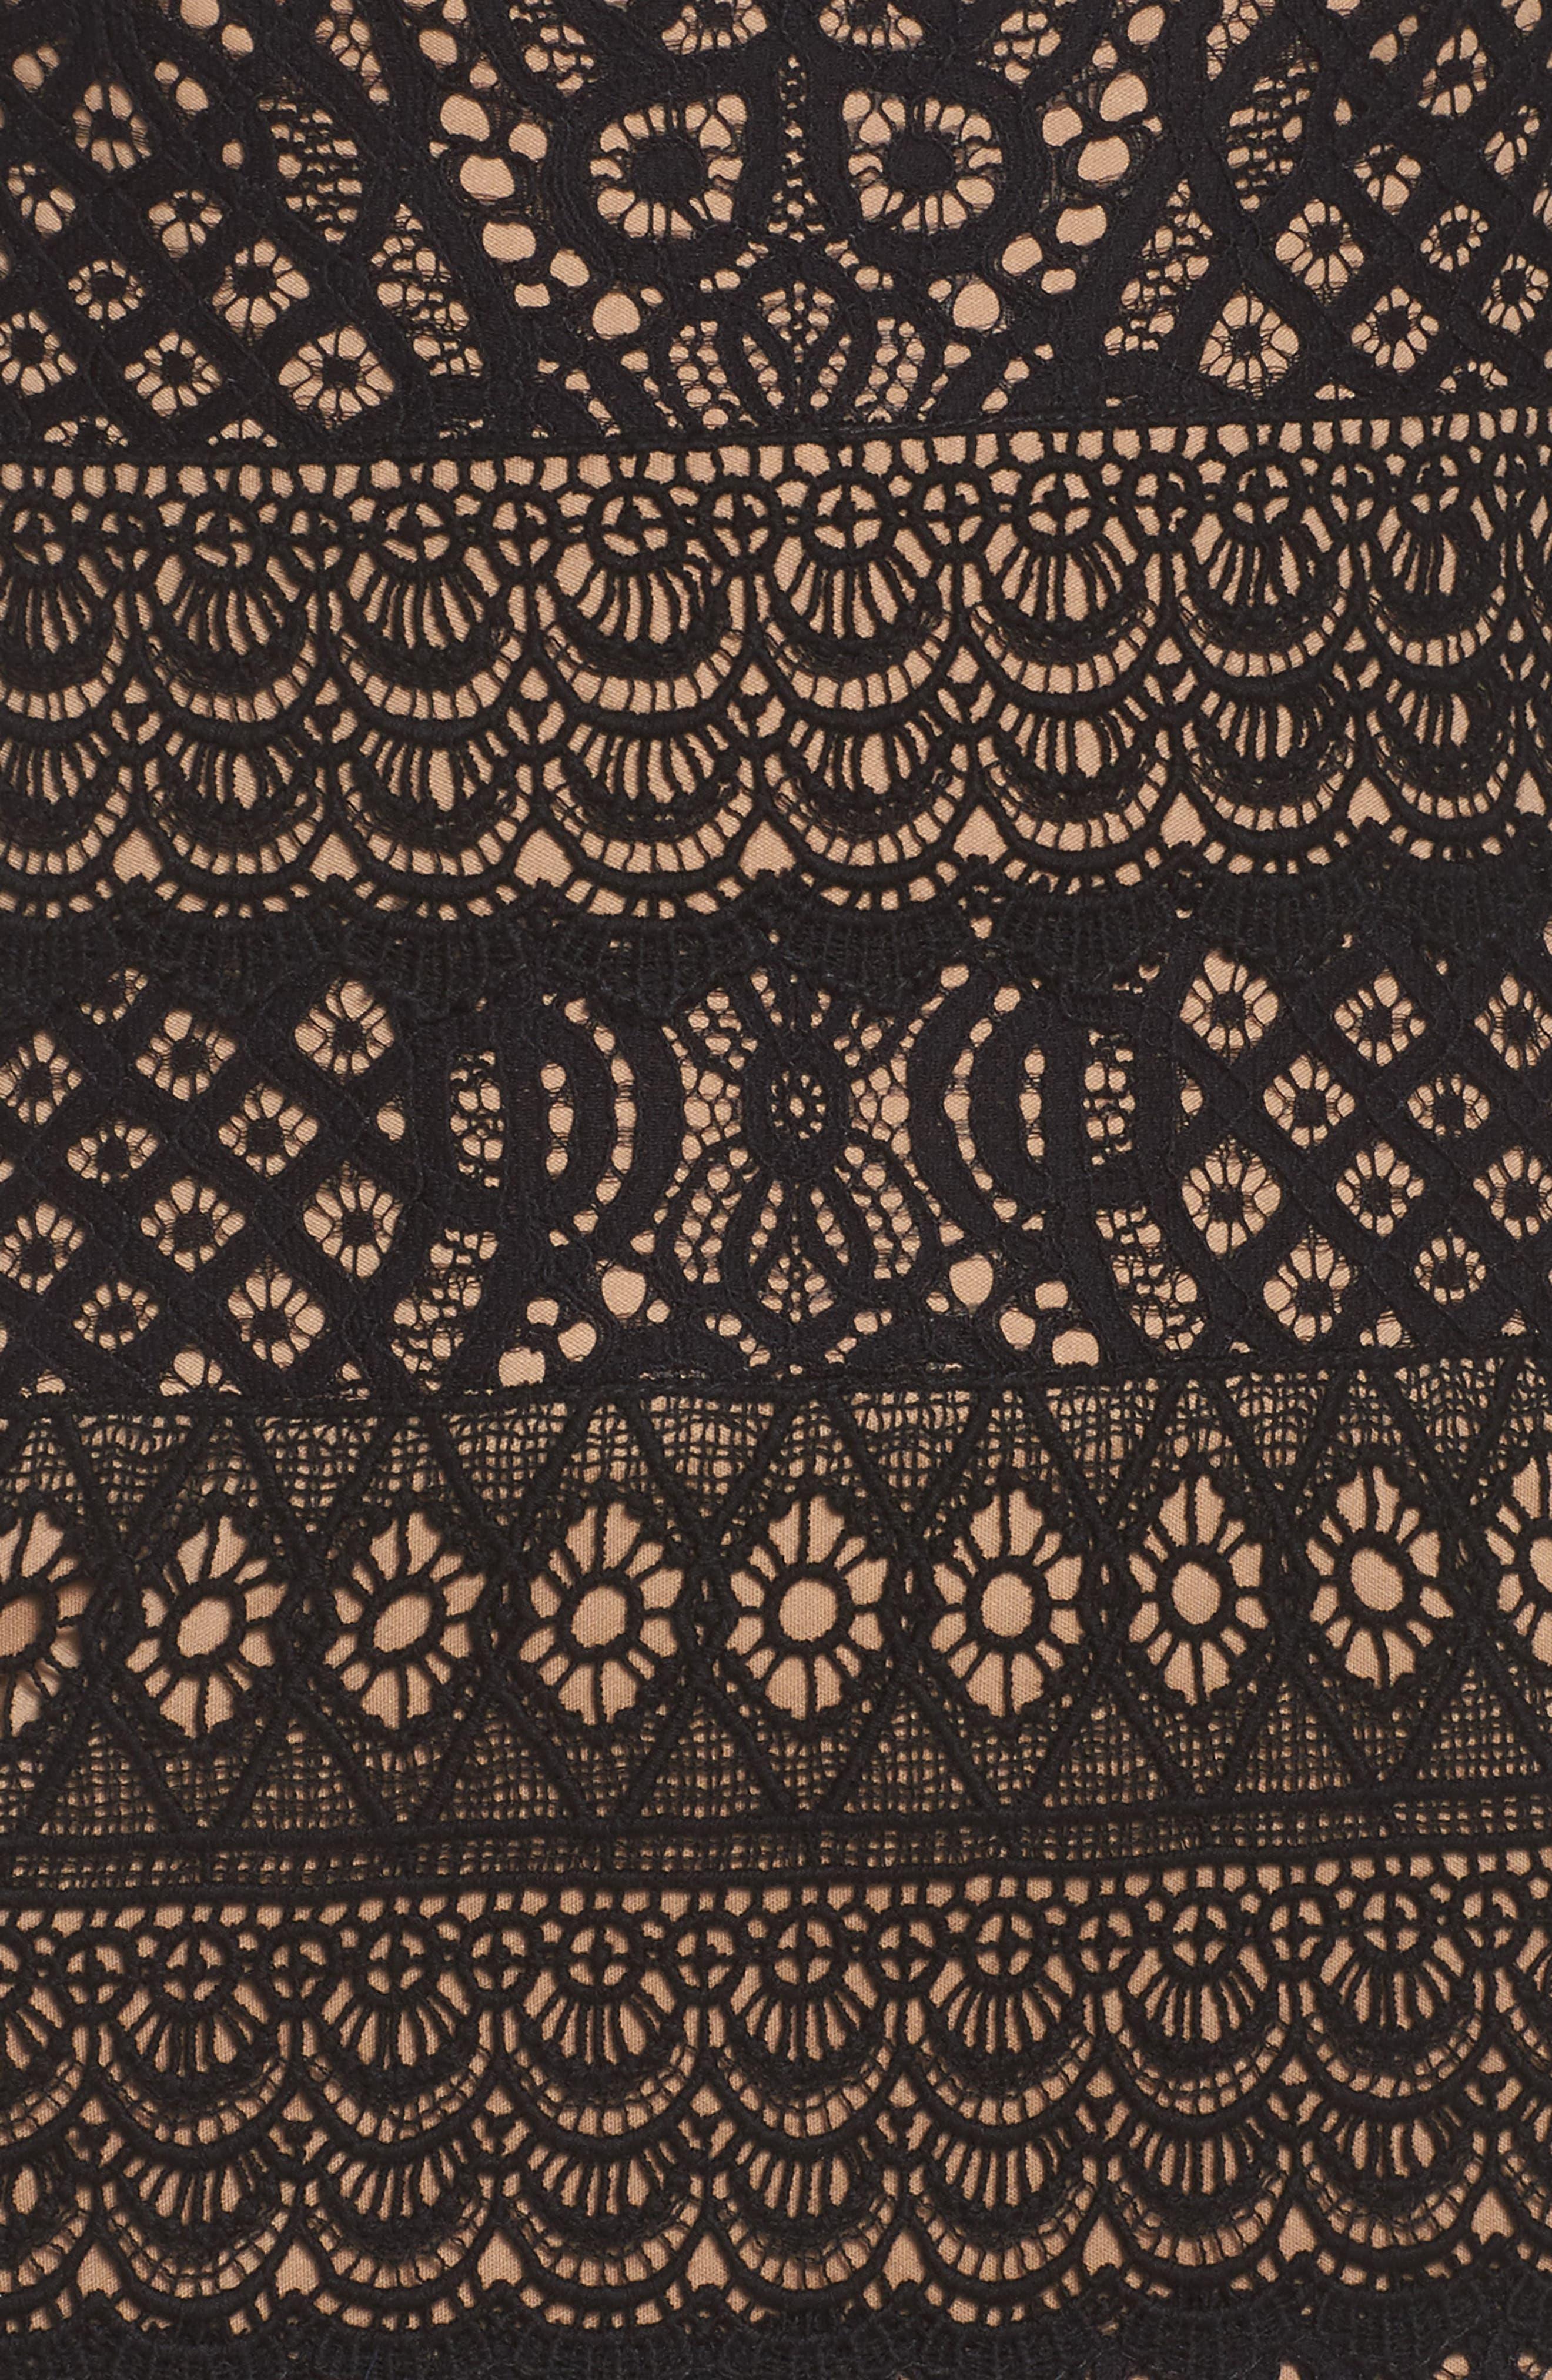 Lace Cap Sleeve Dress,                             Alternate thumbnail 5, color,                             Black / Nude